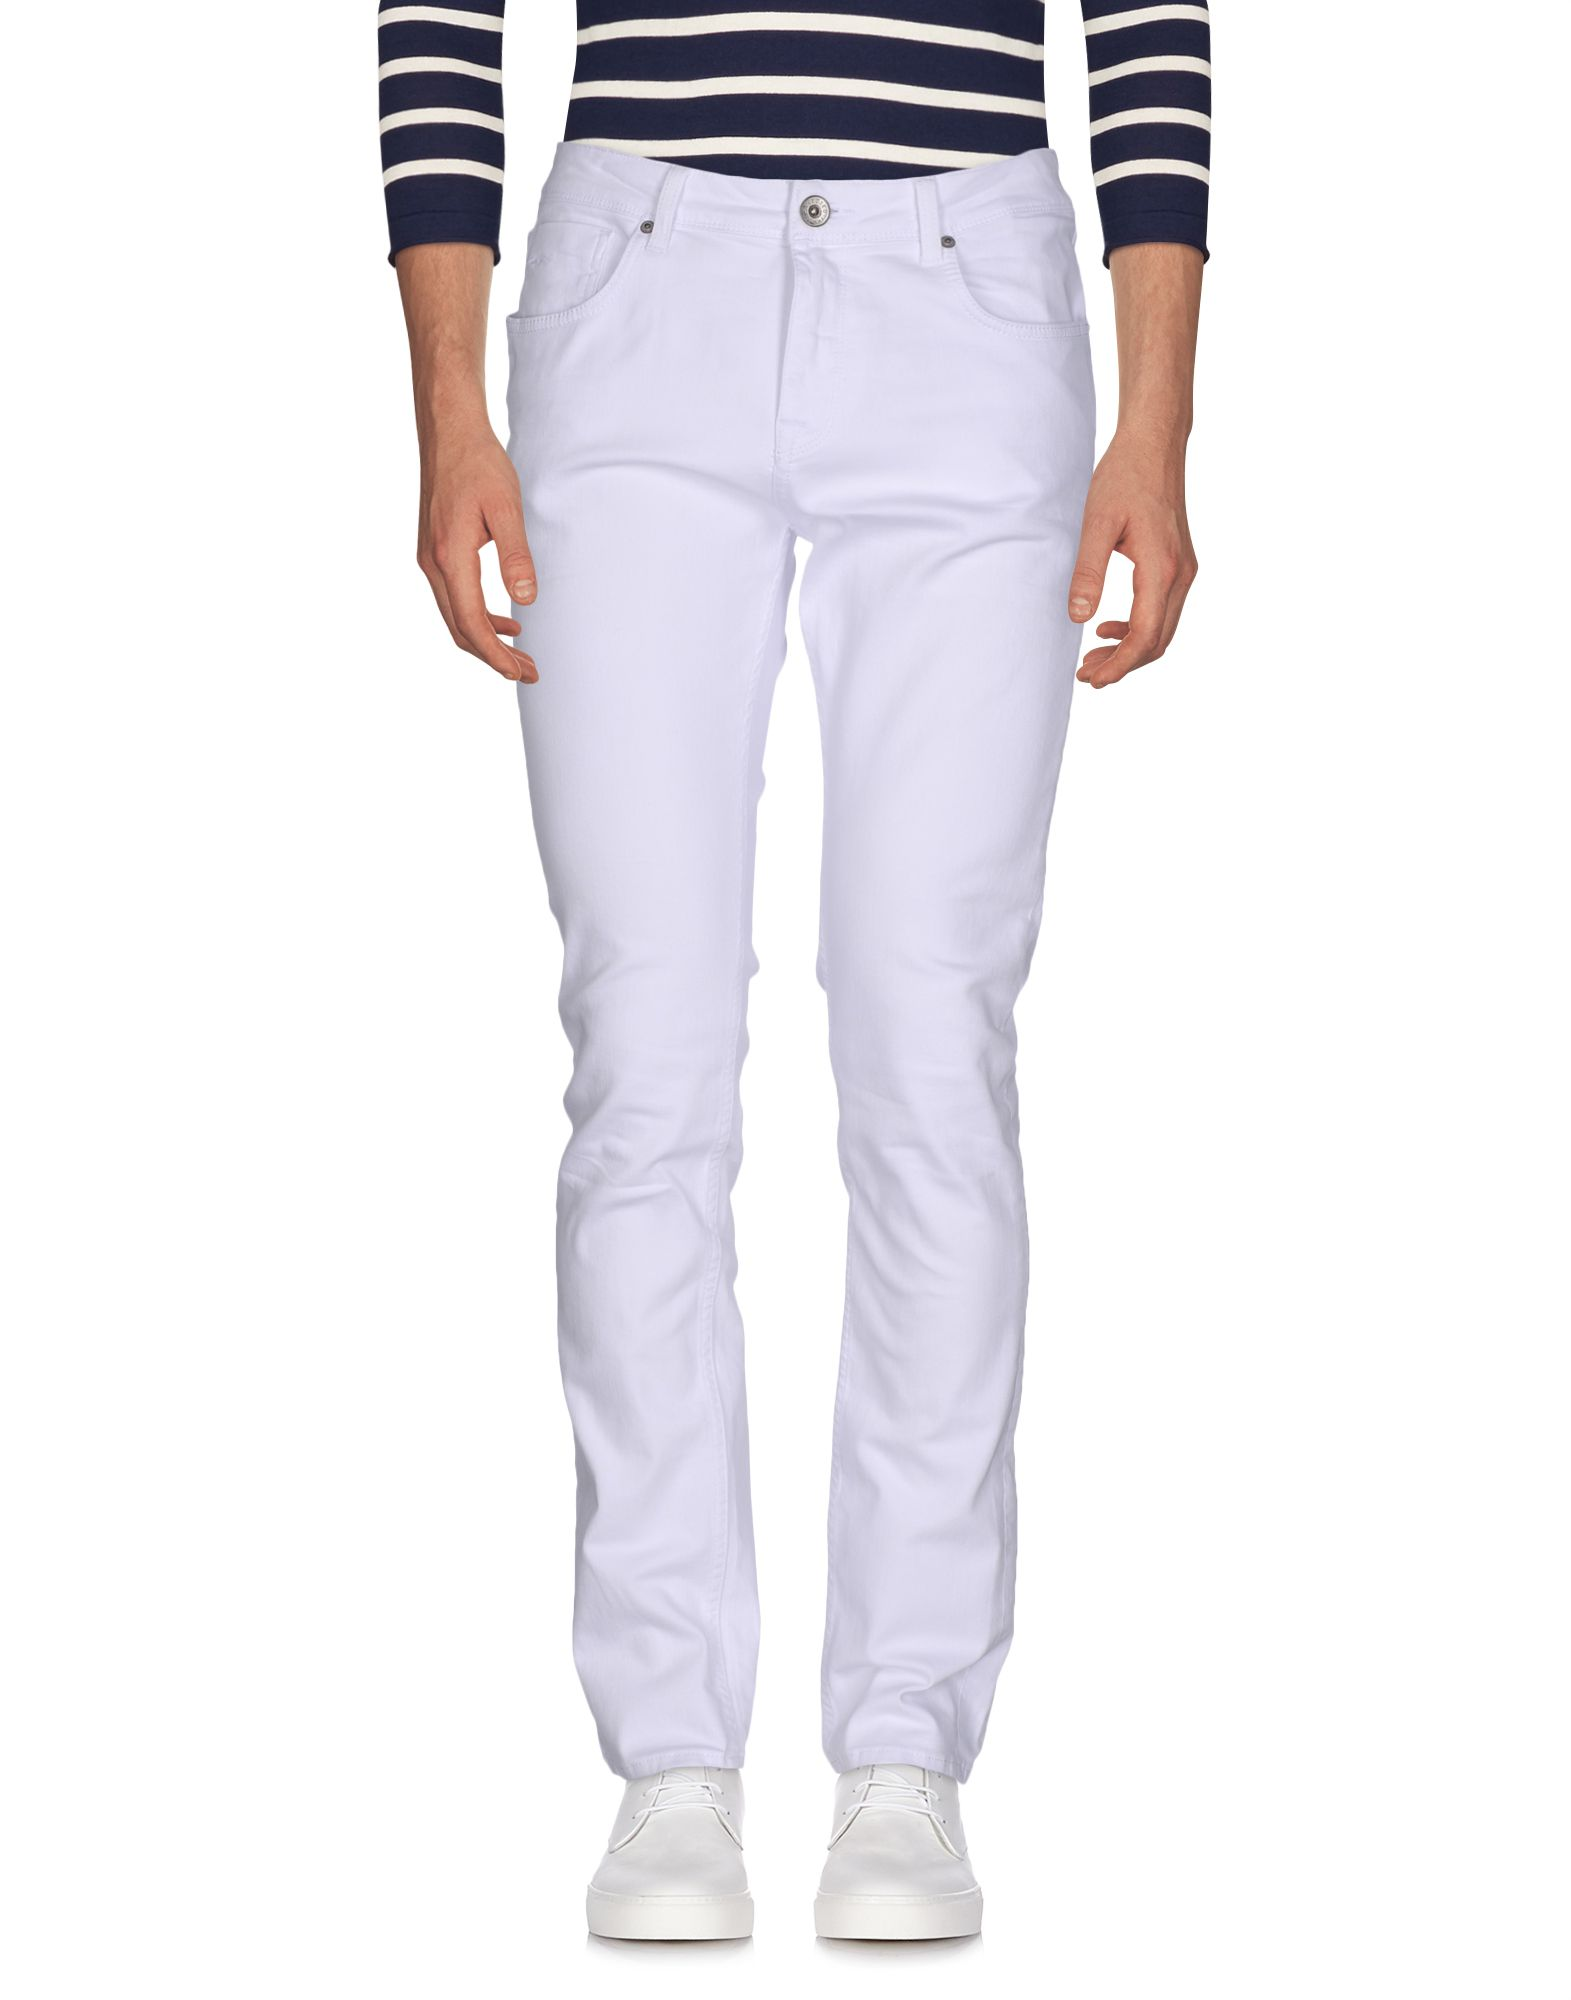 ANTONIO BANDERAS DESIGN by SELECTED HOMME Джинсовые брюки футболка мужская selected homme antonio banderas цвет синий 16051686 размер m 46